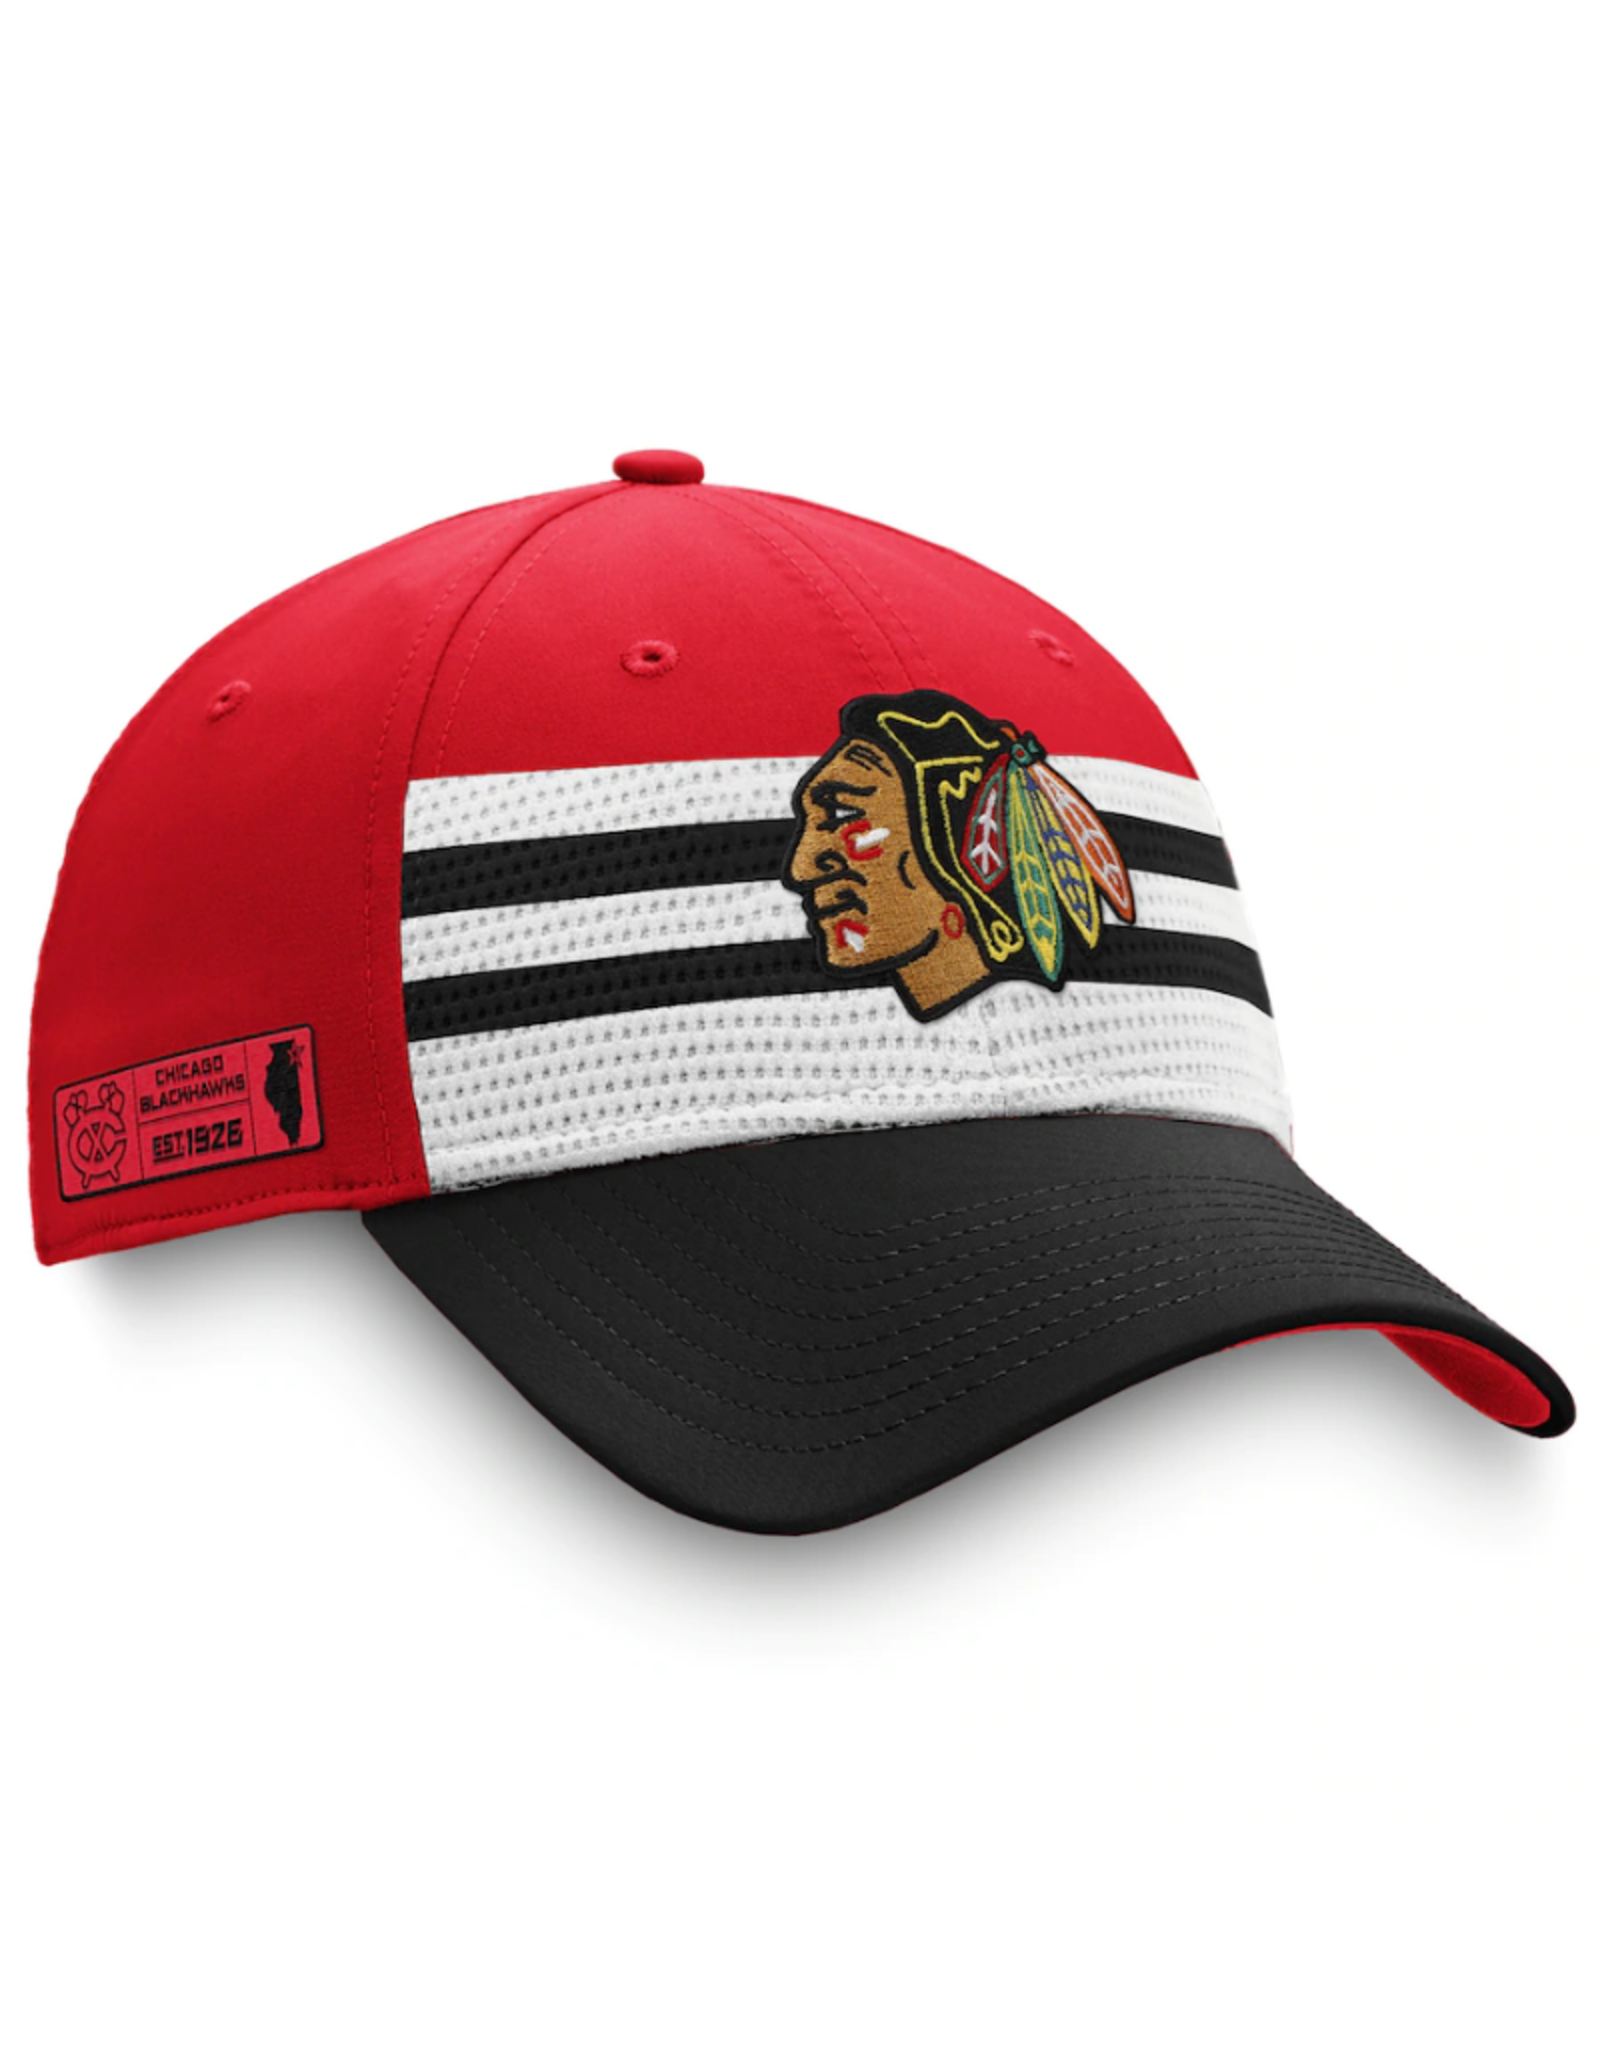 Fanatics Fanatics '20 Authentic Pro Draft Flex Hat Chicago Blackhawks Red